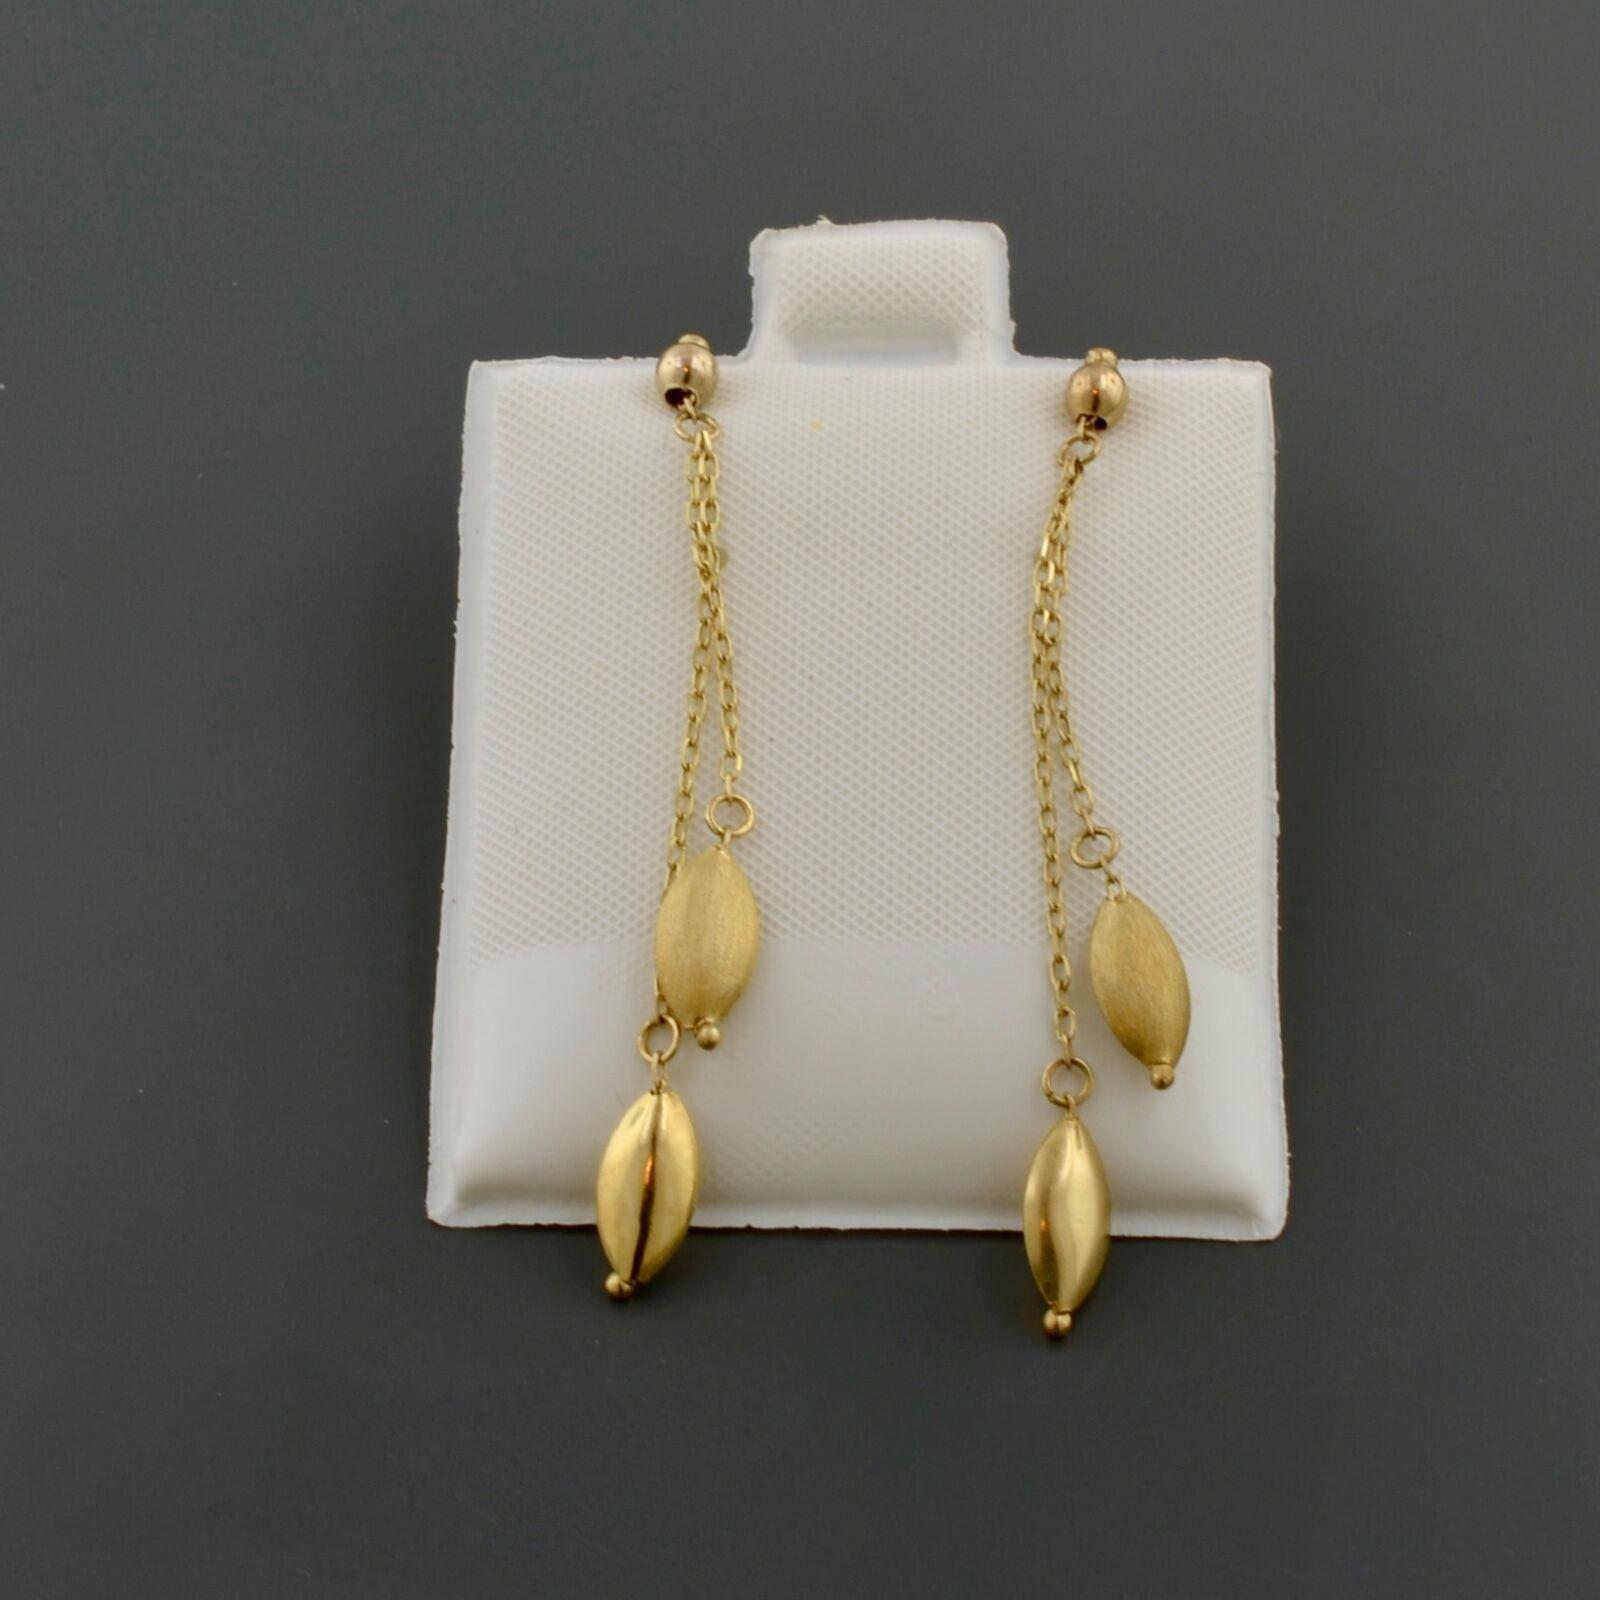 10K YELLOW gold POLISHED AND SATIN OVAL BEAD DANGLE STUD EARRINGS